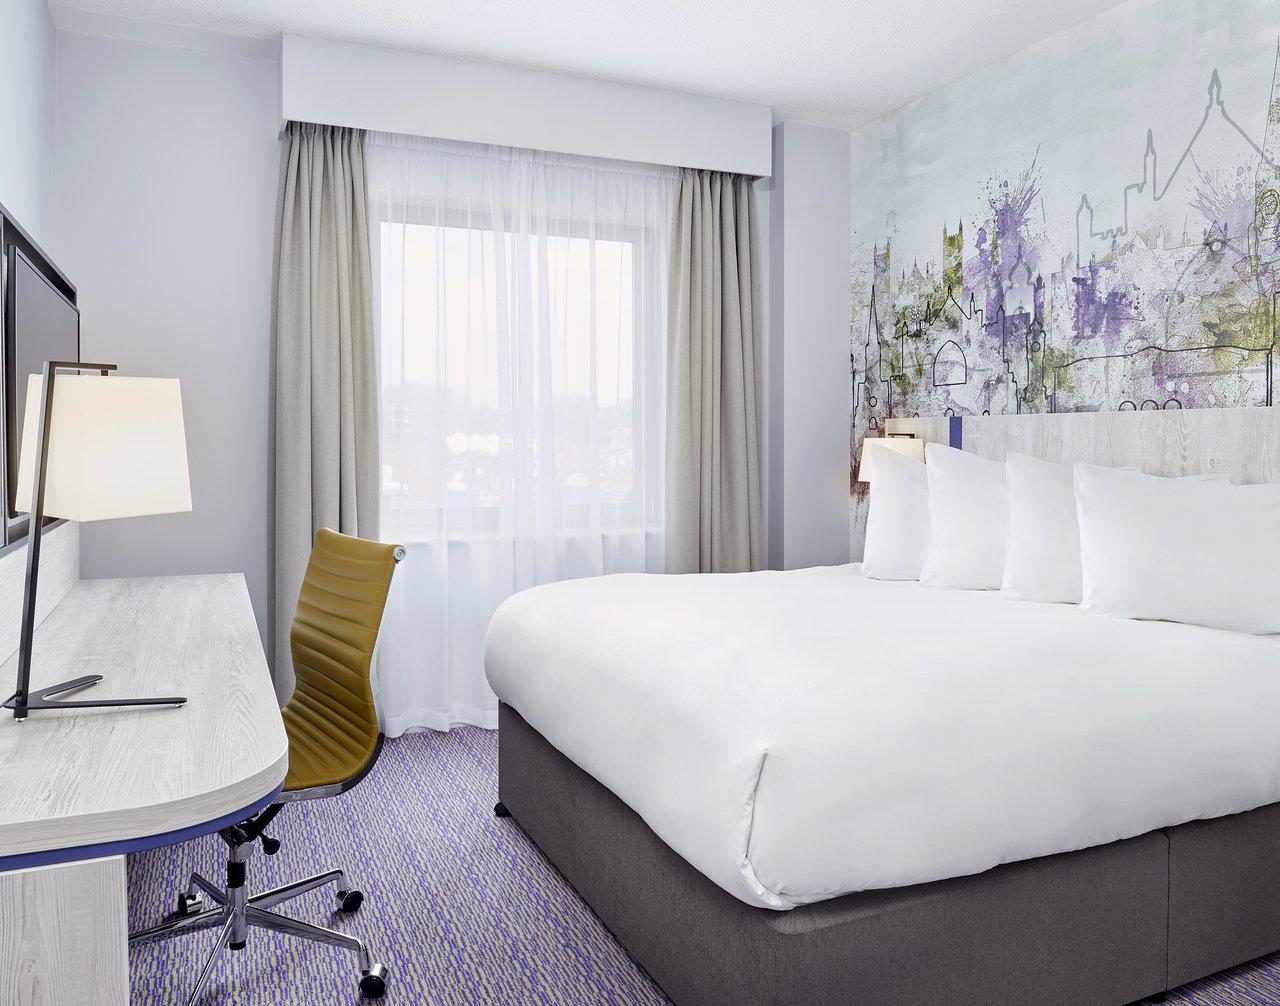 jurys inn exeter updated 2019 prices hotel reviews and photos rh tripadvisor co uk